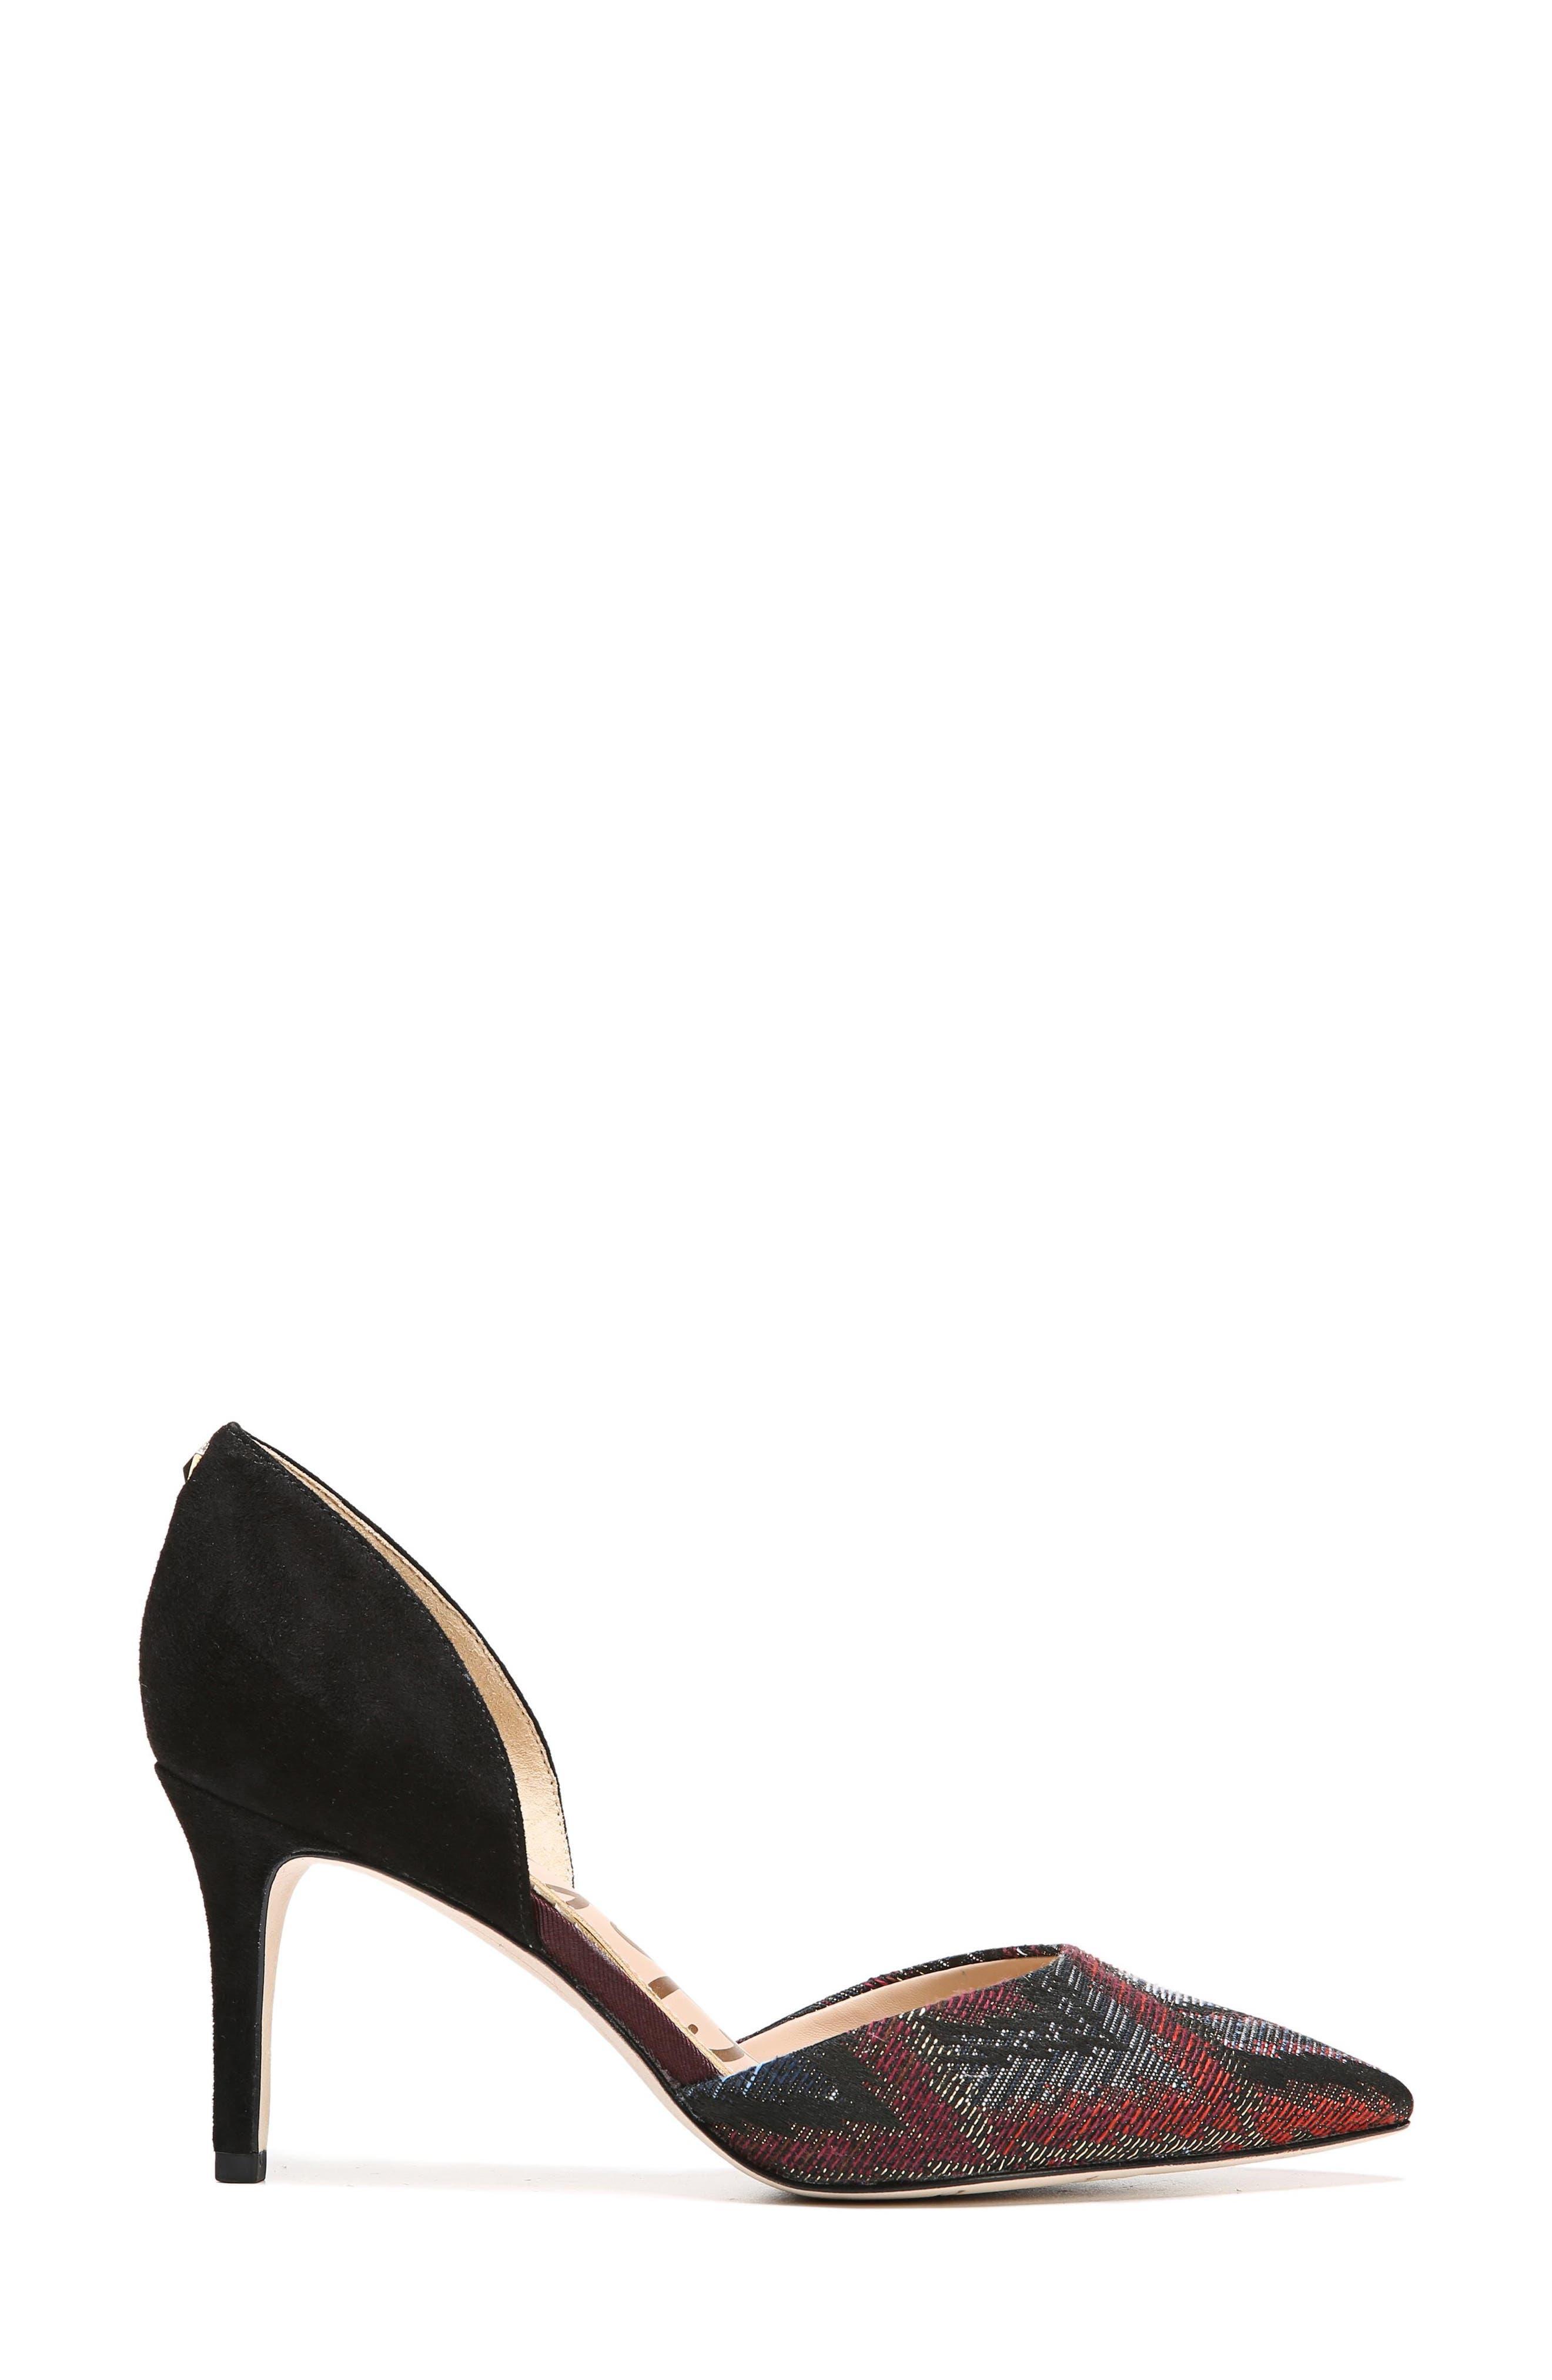 Alternate Image 3  - Sam Edelman 'Telsa' d'Orsay Pointy Toe Pump (Women)